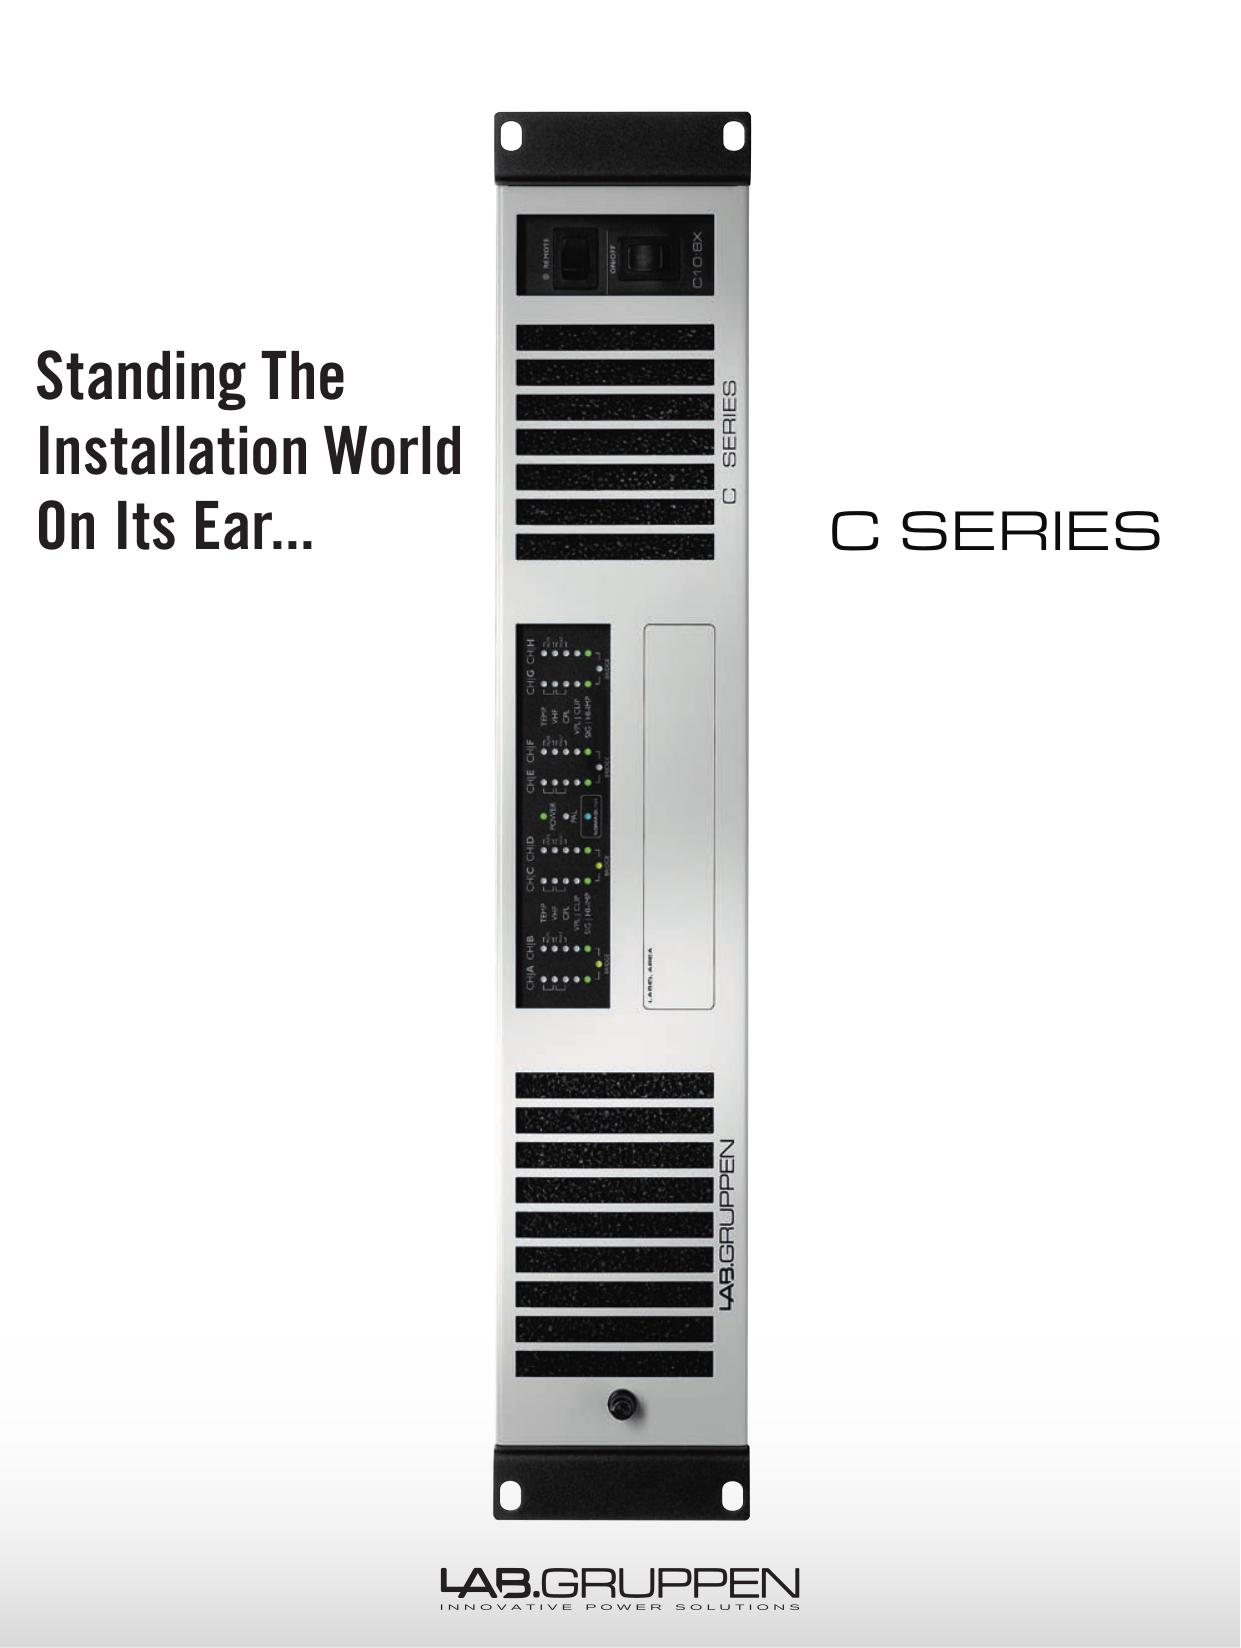 pdf for Lab.gruppen Amp C Series C 5 4X manual